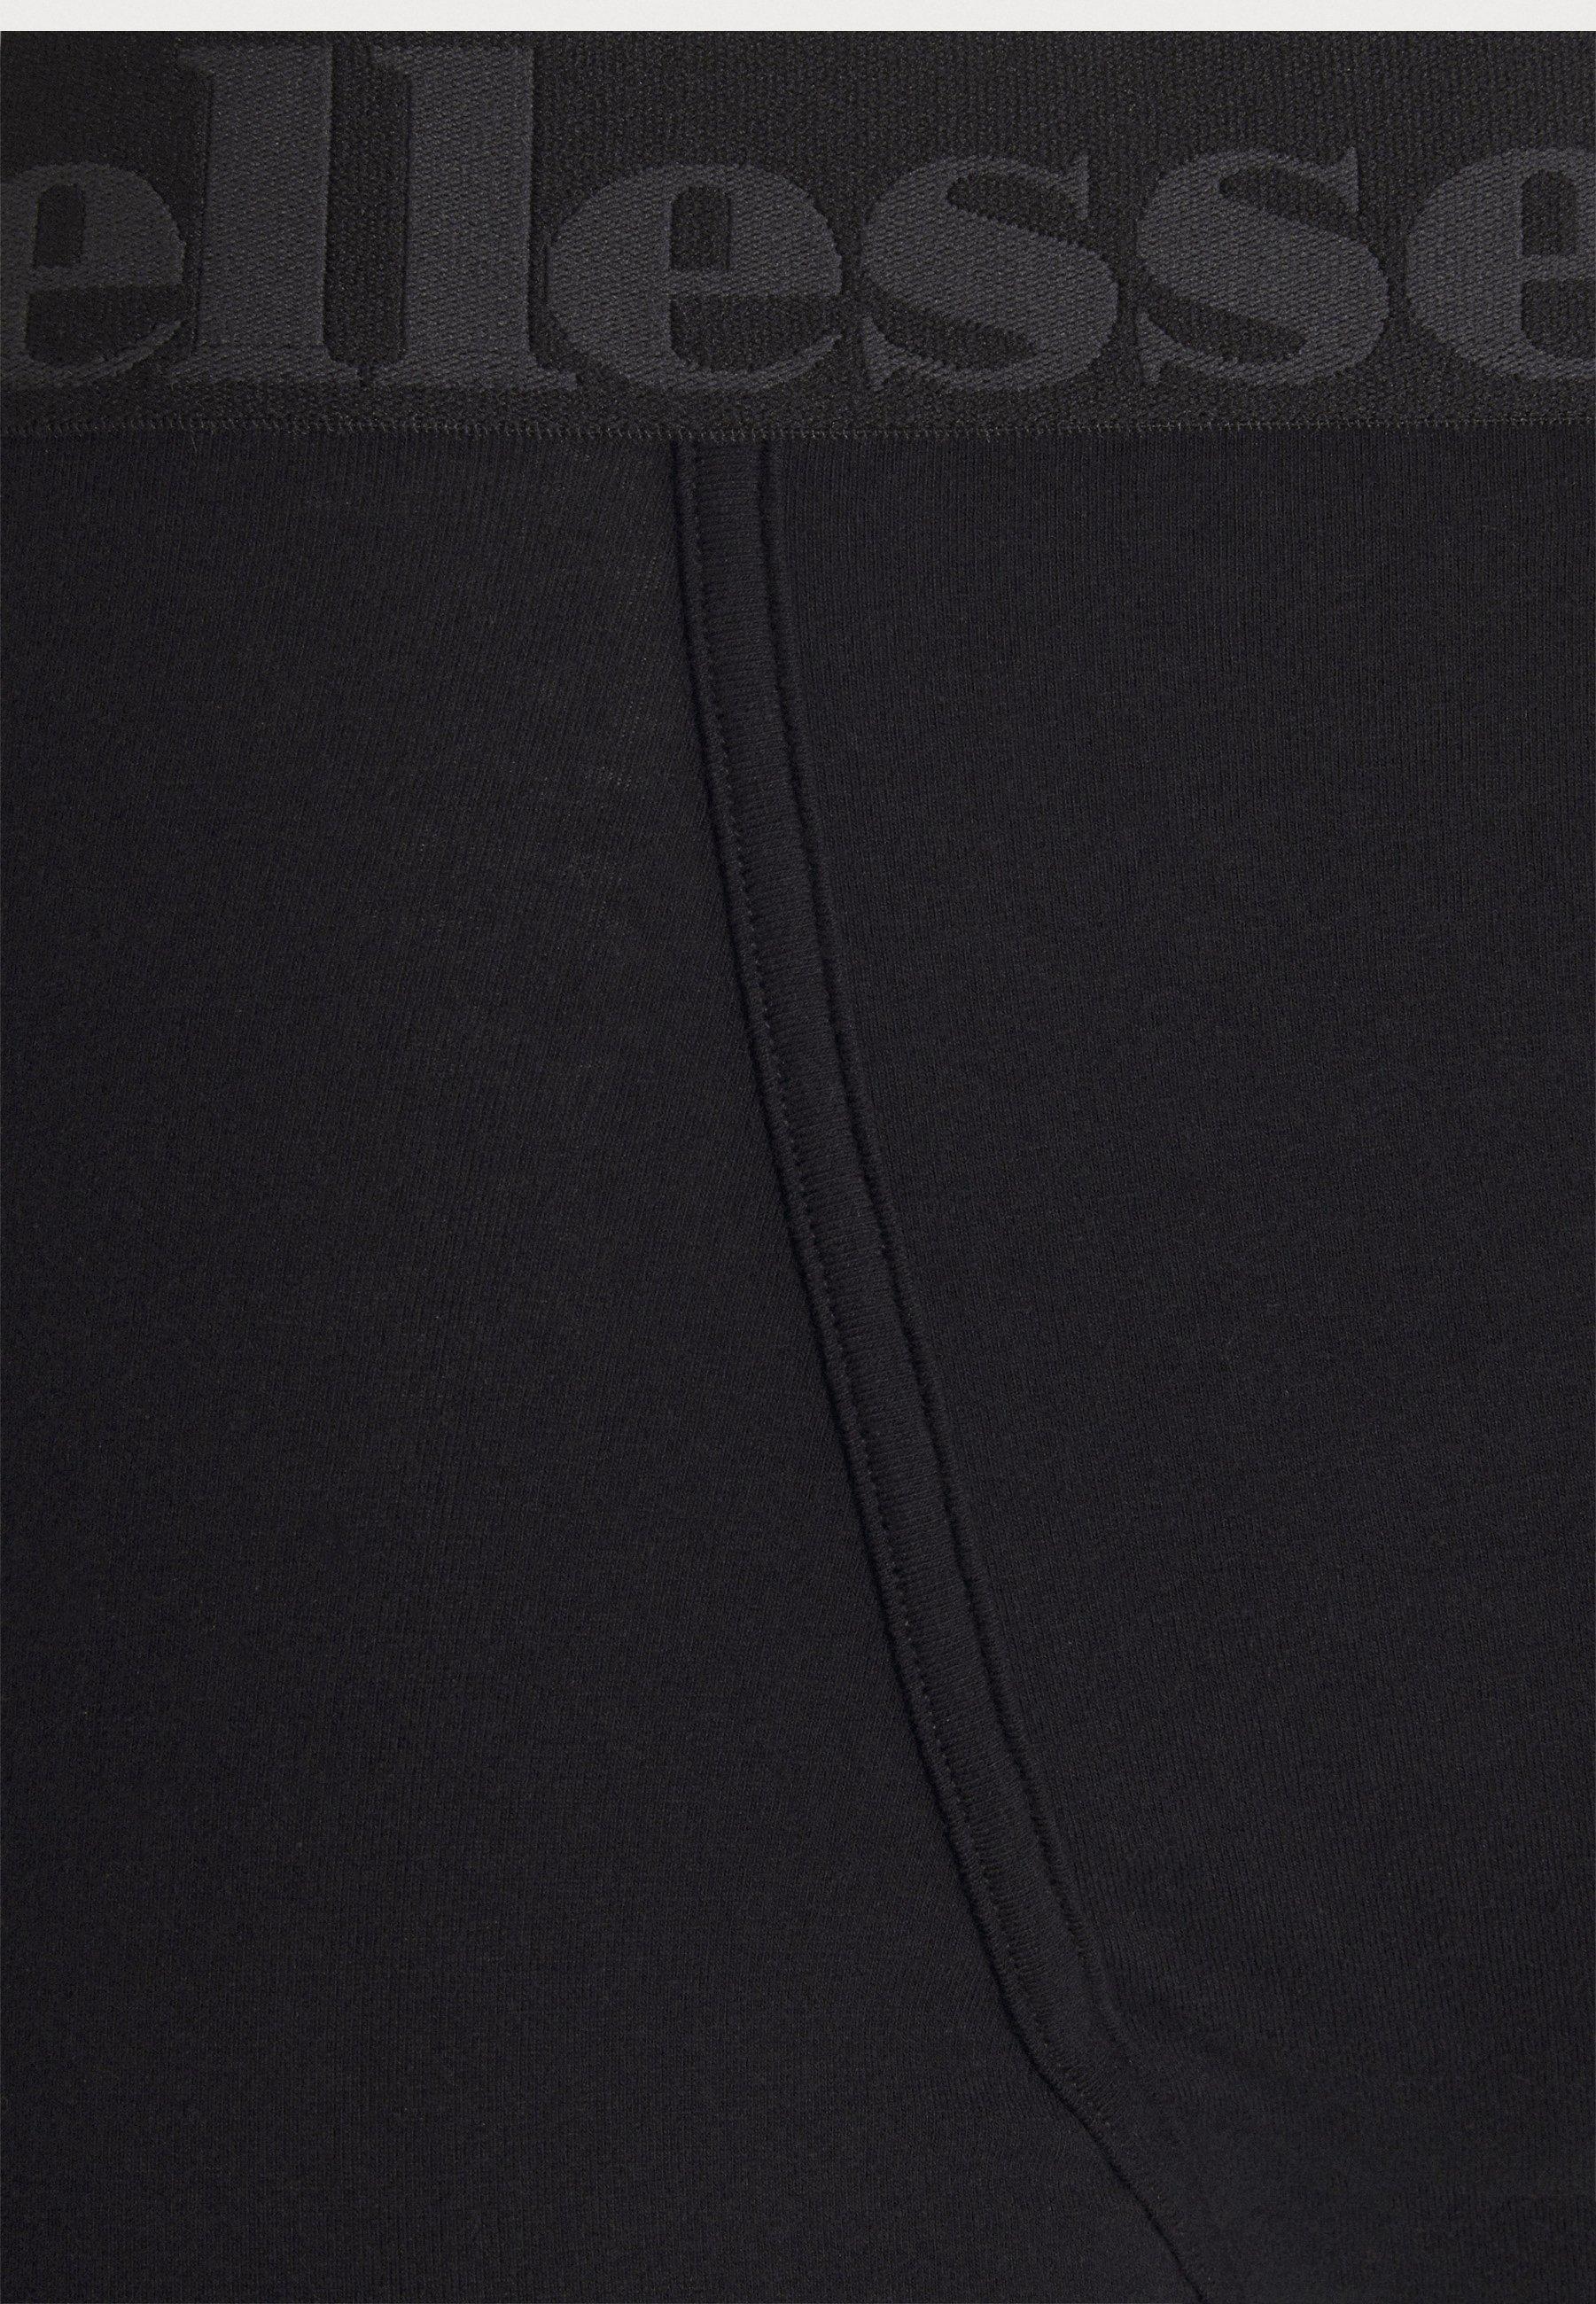 Uomo NURRA FASHION TRUNKS 5 PACK - Culotte